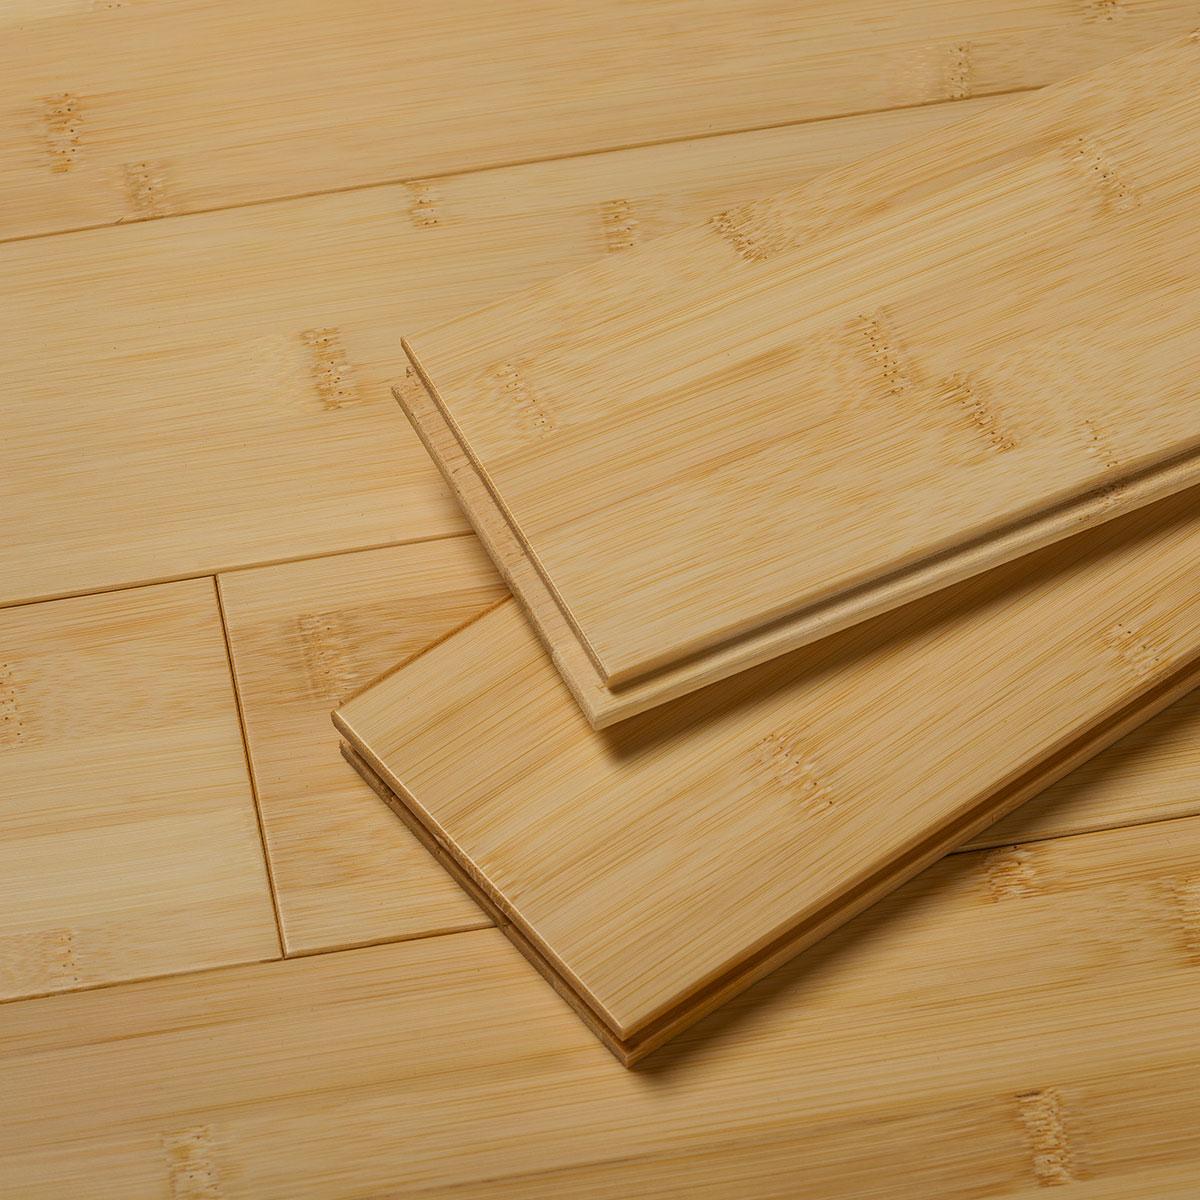 Natural Flat Grain Bamboo Flooring